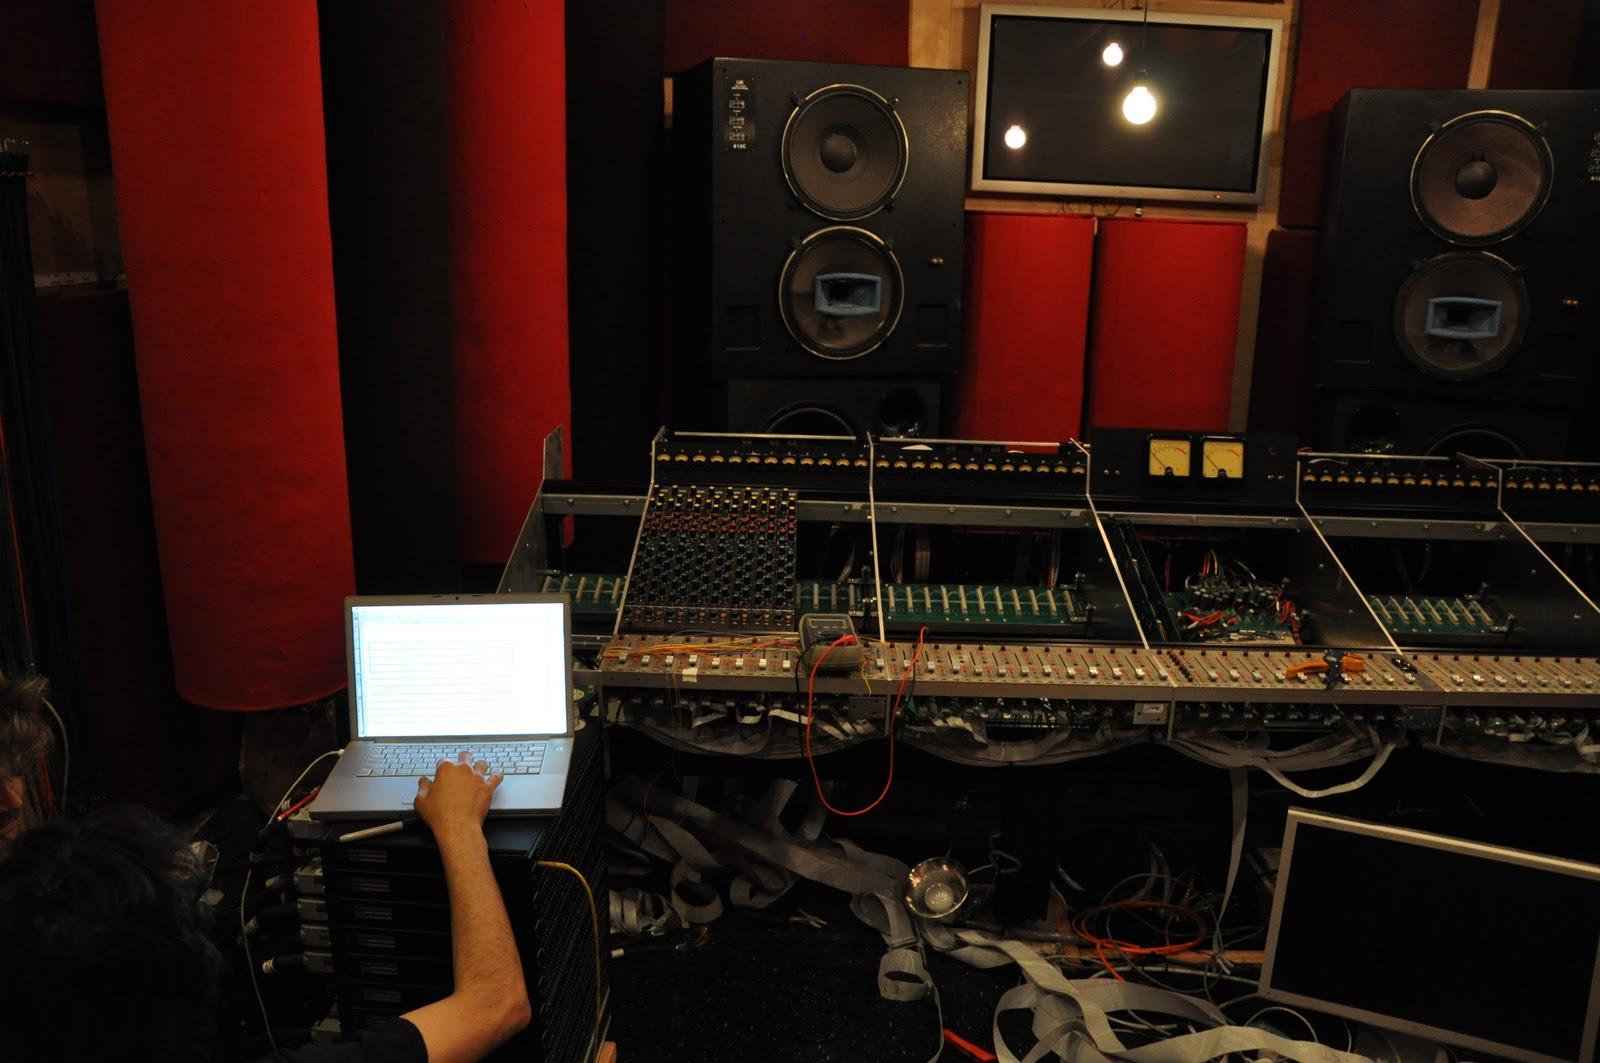 Recording Studio Wiring Diagrams Mikes Undertone Audio Adventures Barefoot History And Diagram Me On The Floor